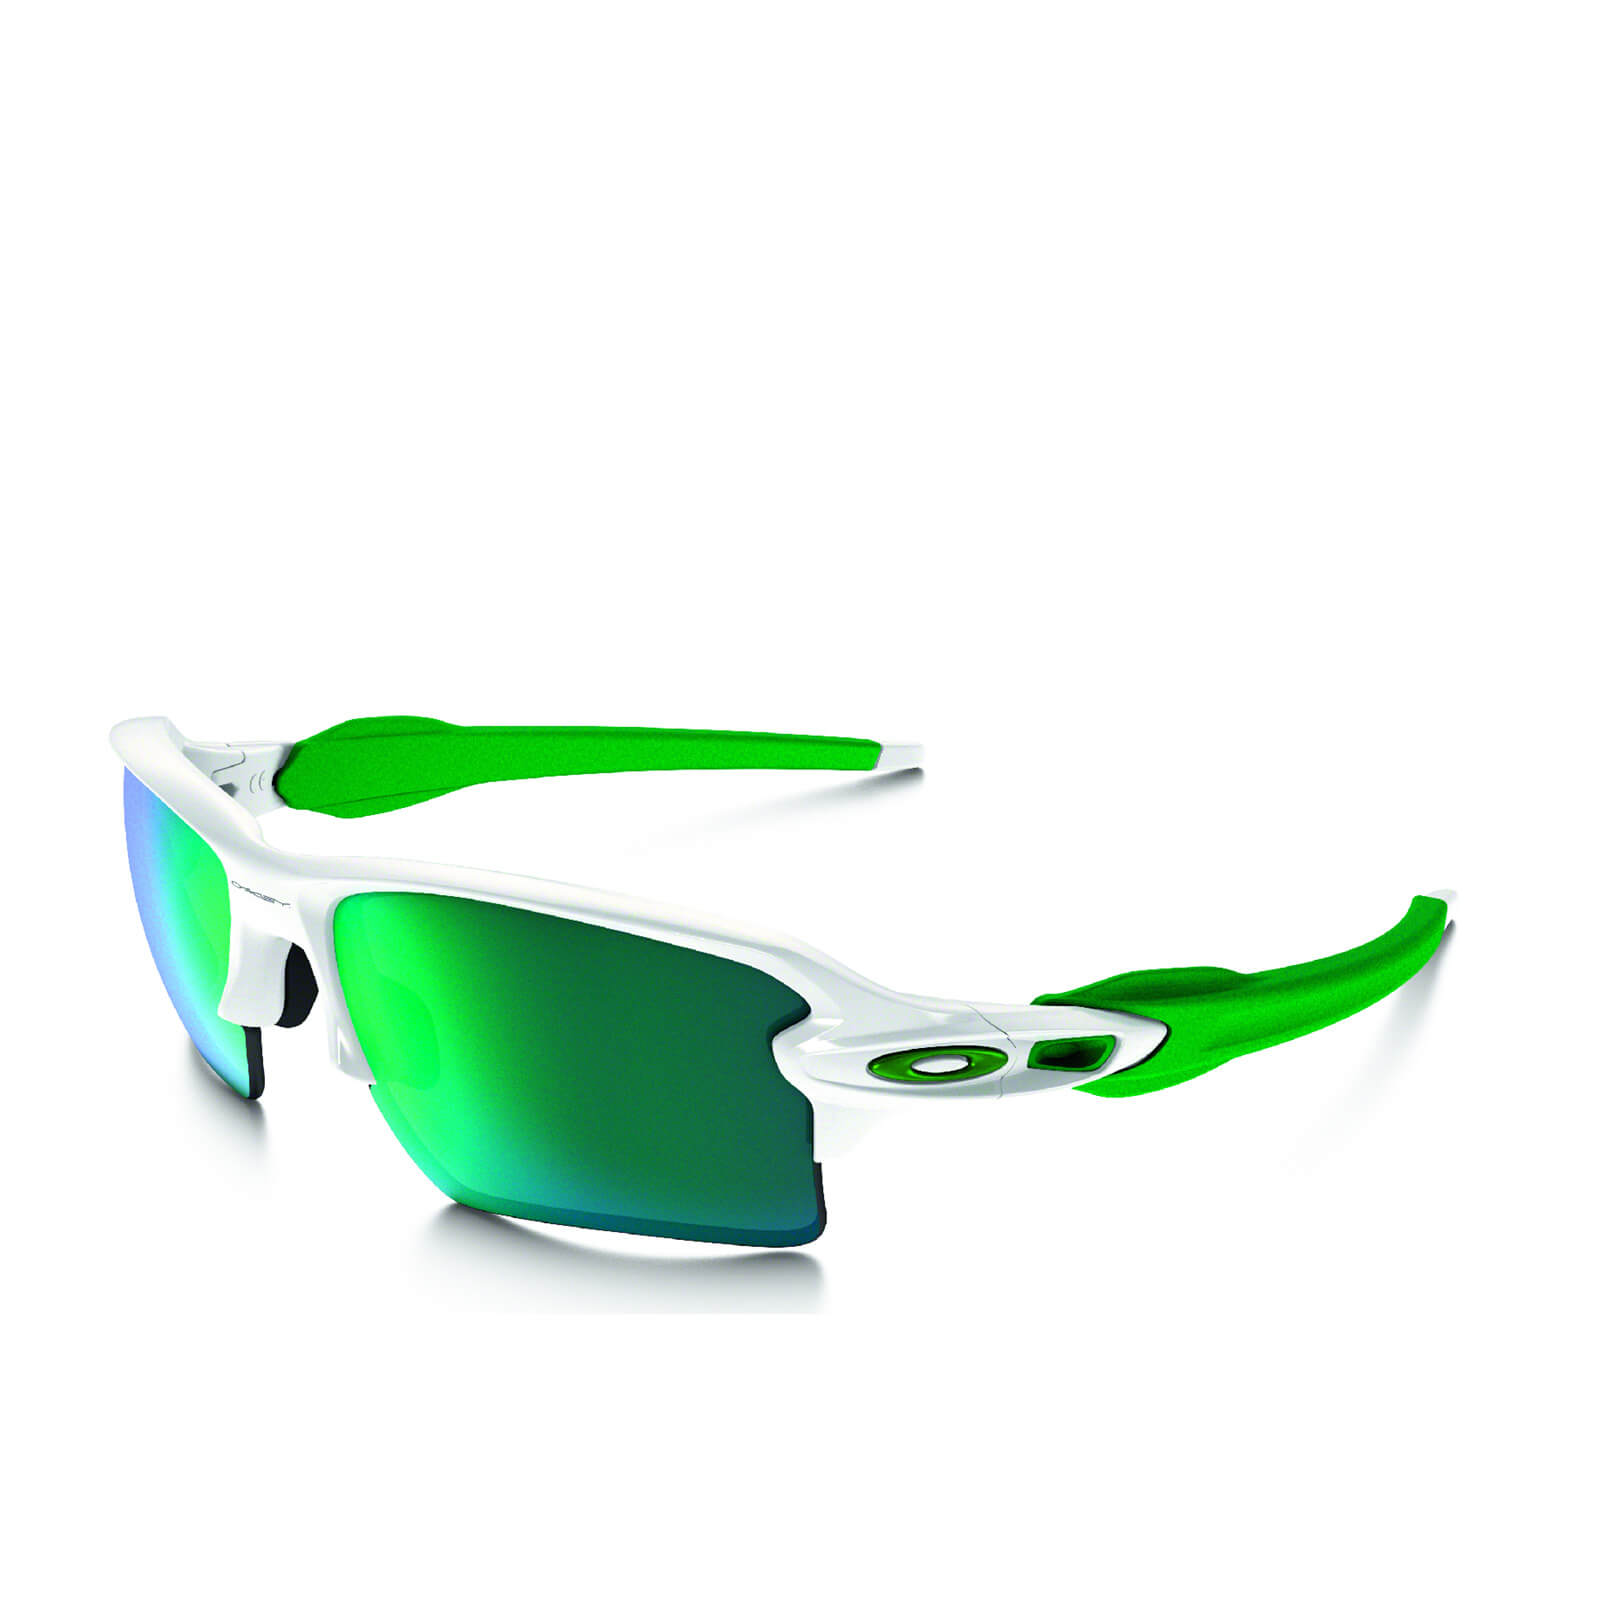 a5920cb9ce Oakley Flak 2.0 XL Sunglasses - Polished White Jade Iridium ...